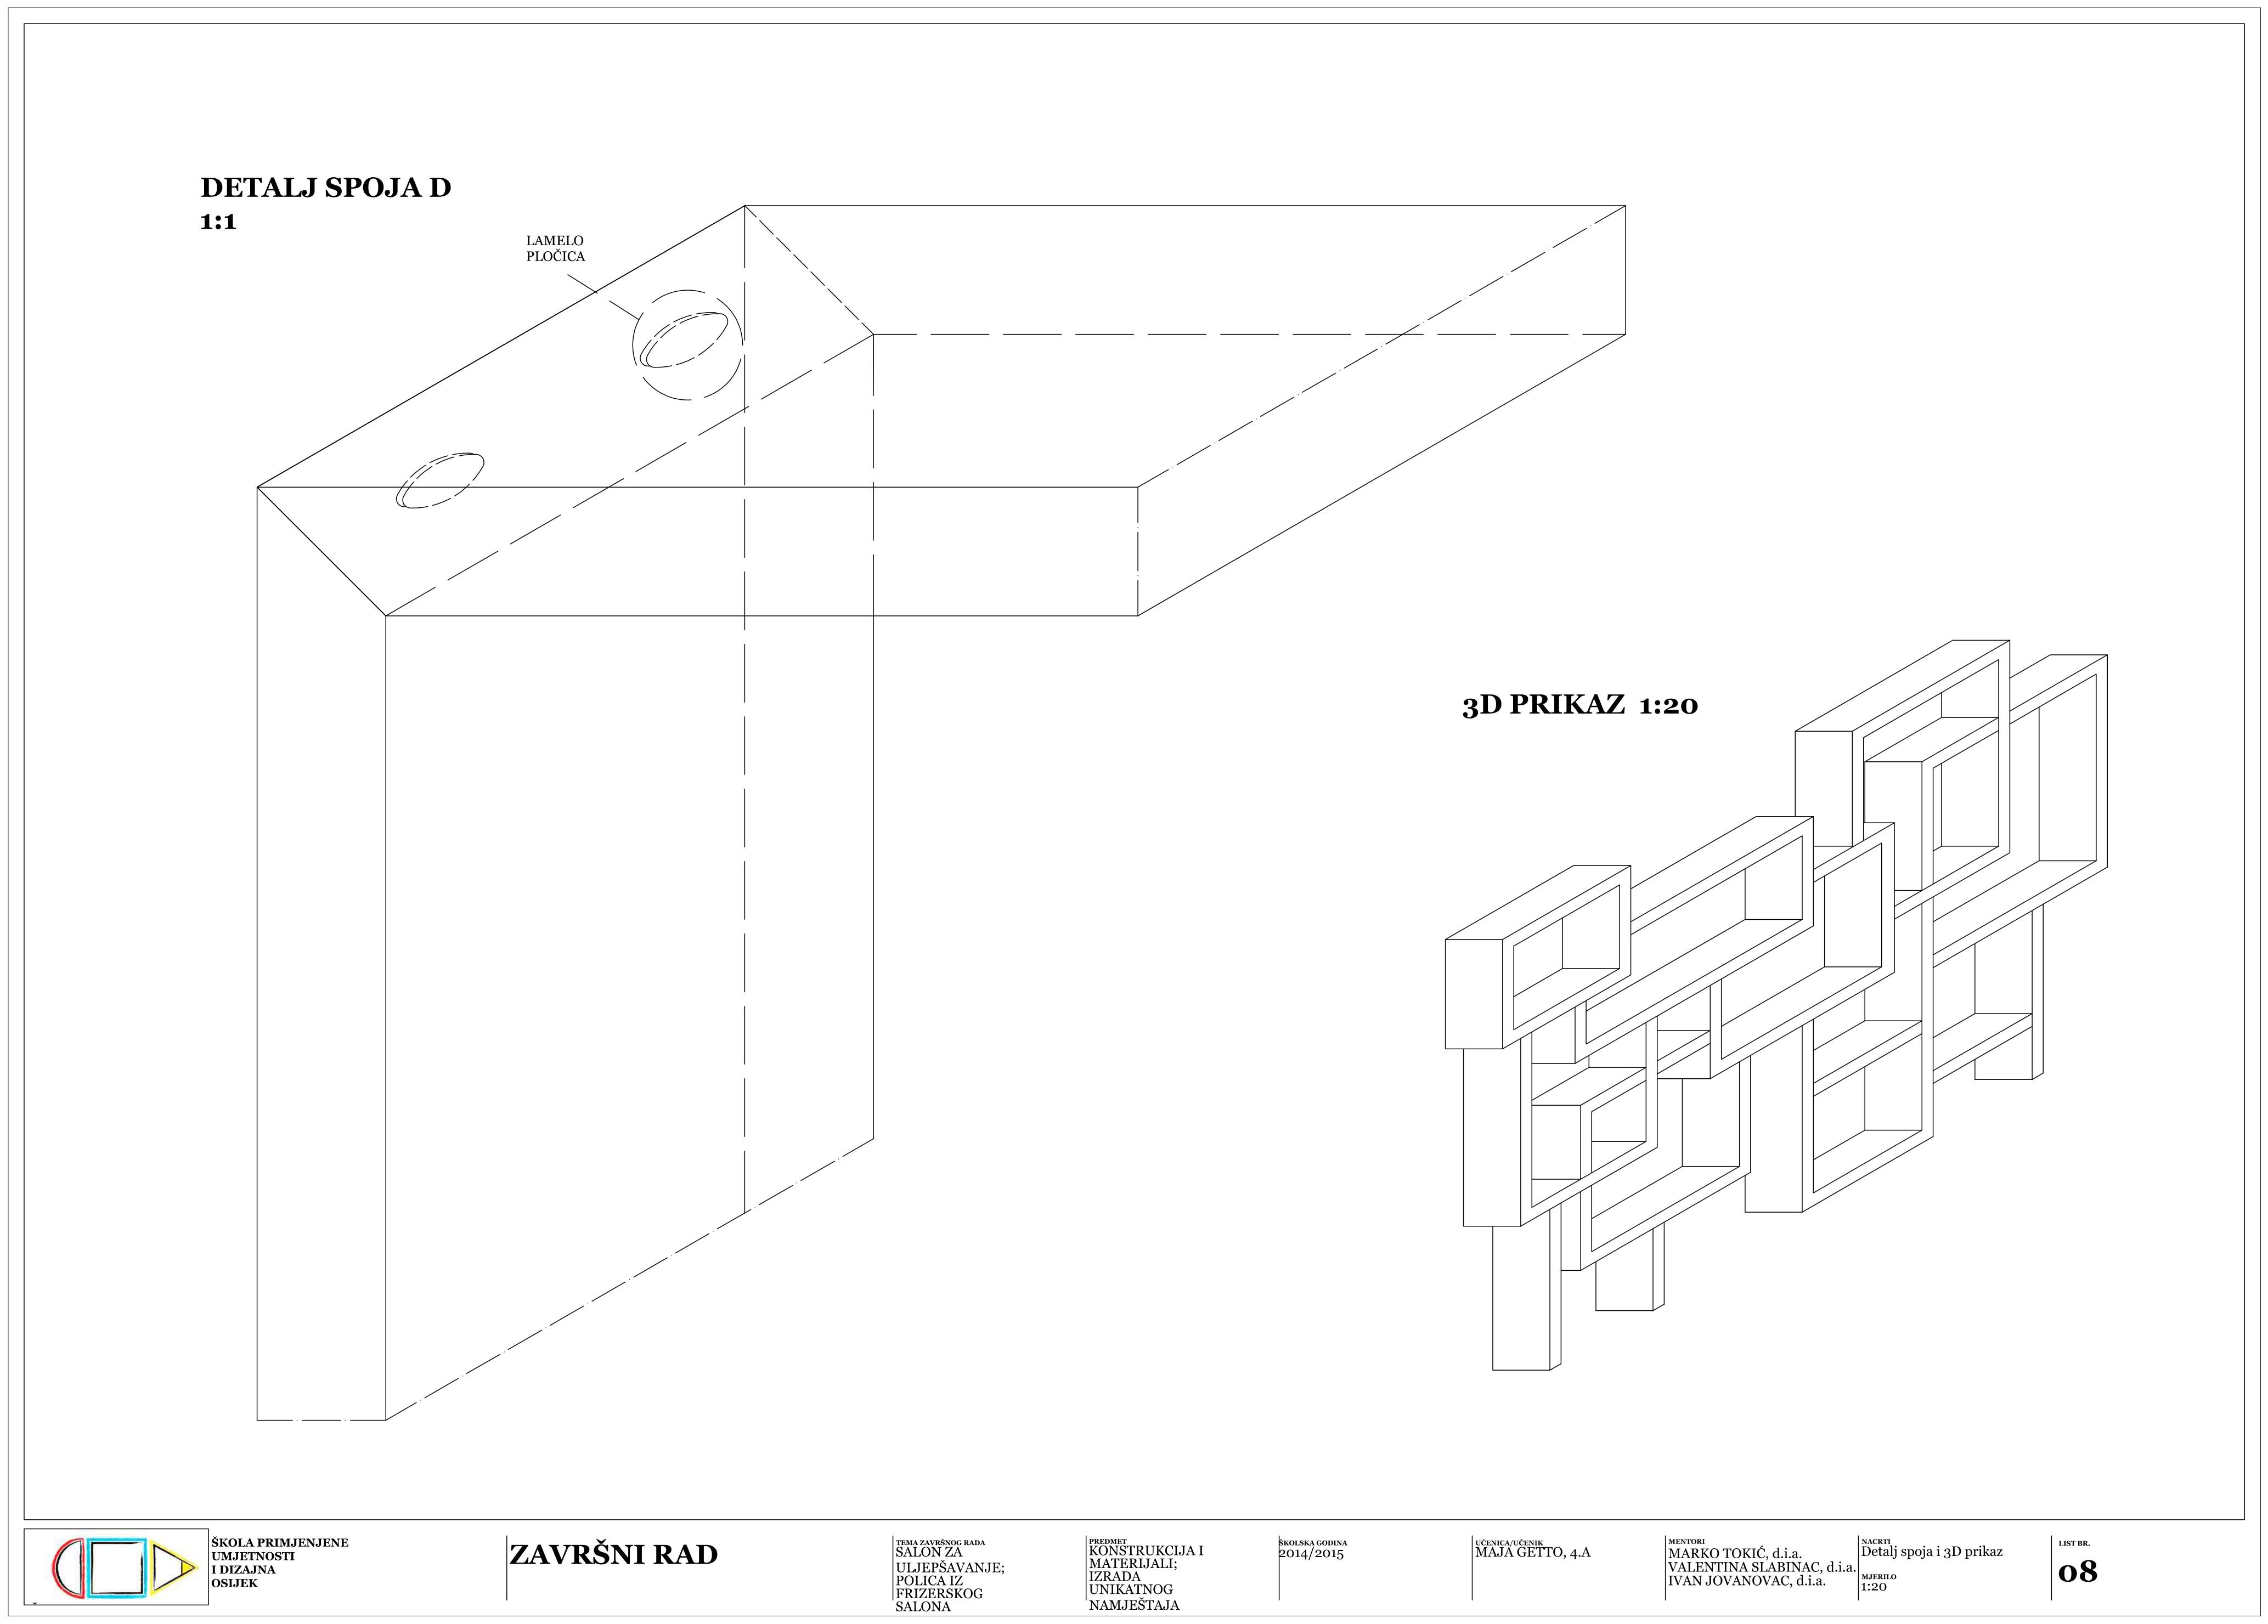 Dizajn namještaja : Detalj spoja i 3D prikaz